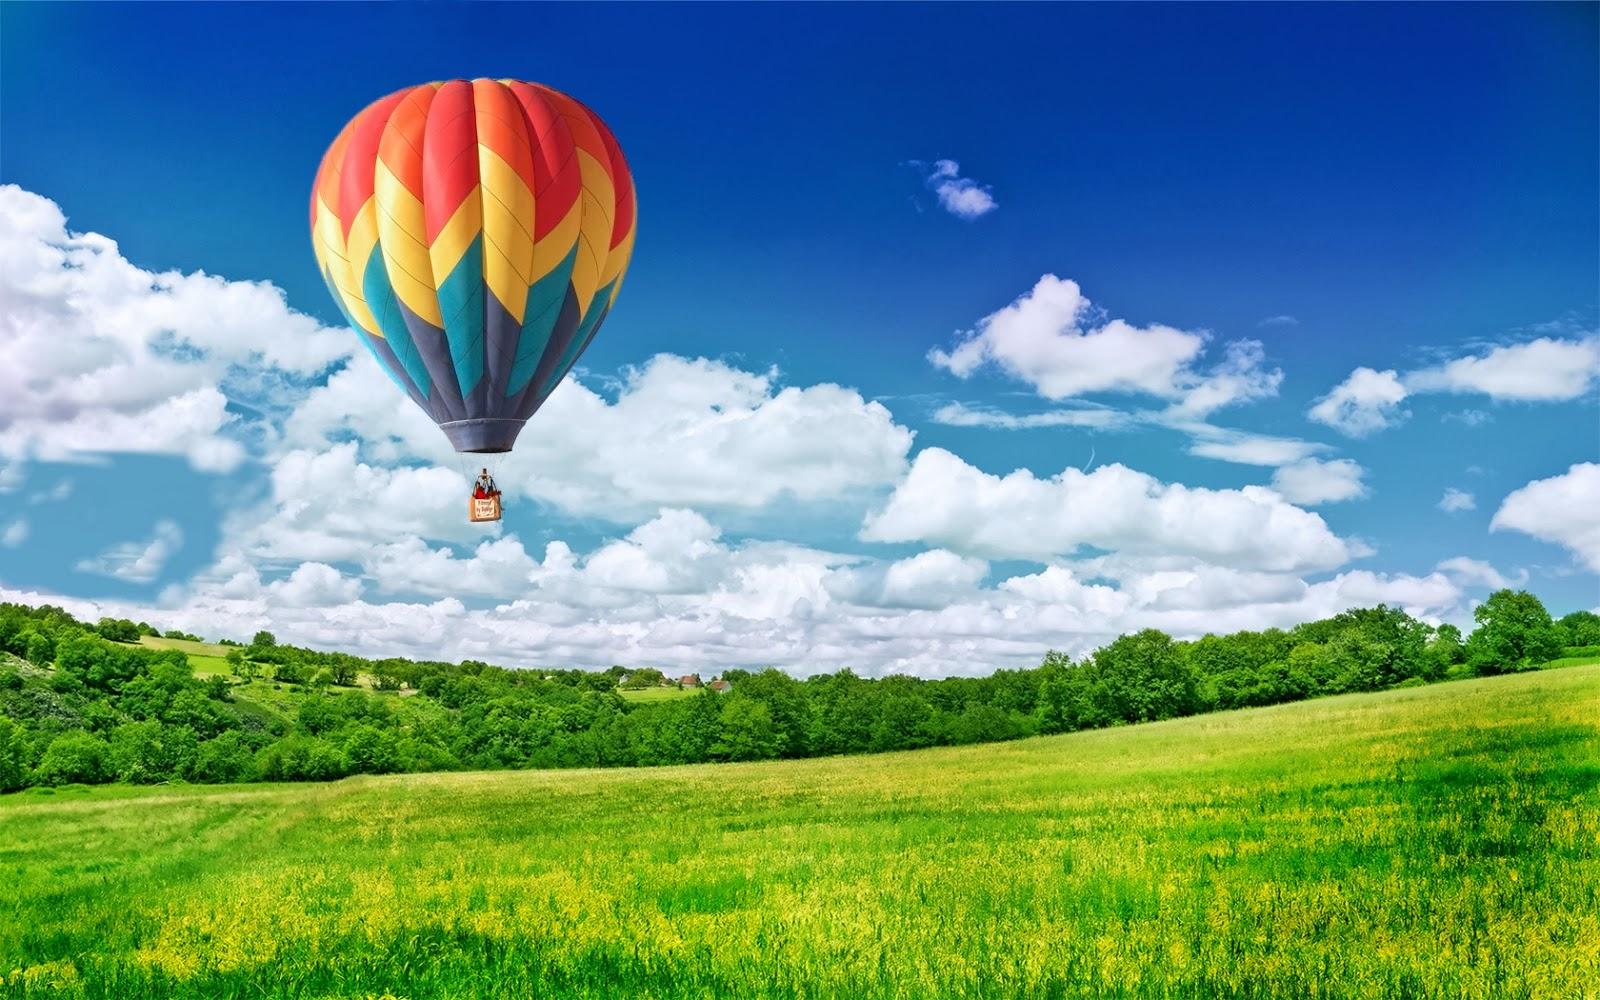 "<img src=""http://4.bp.blogspot.com/-94Uf420KYvU/Ut_r9E_ufeI/AAAAAAAAJvc/AYOyEP8bRJc/s1600/balloon-in-sky-.jpg"" alt=""ballon in sky"" />"